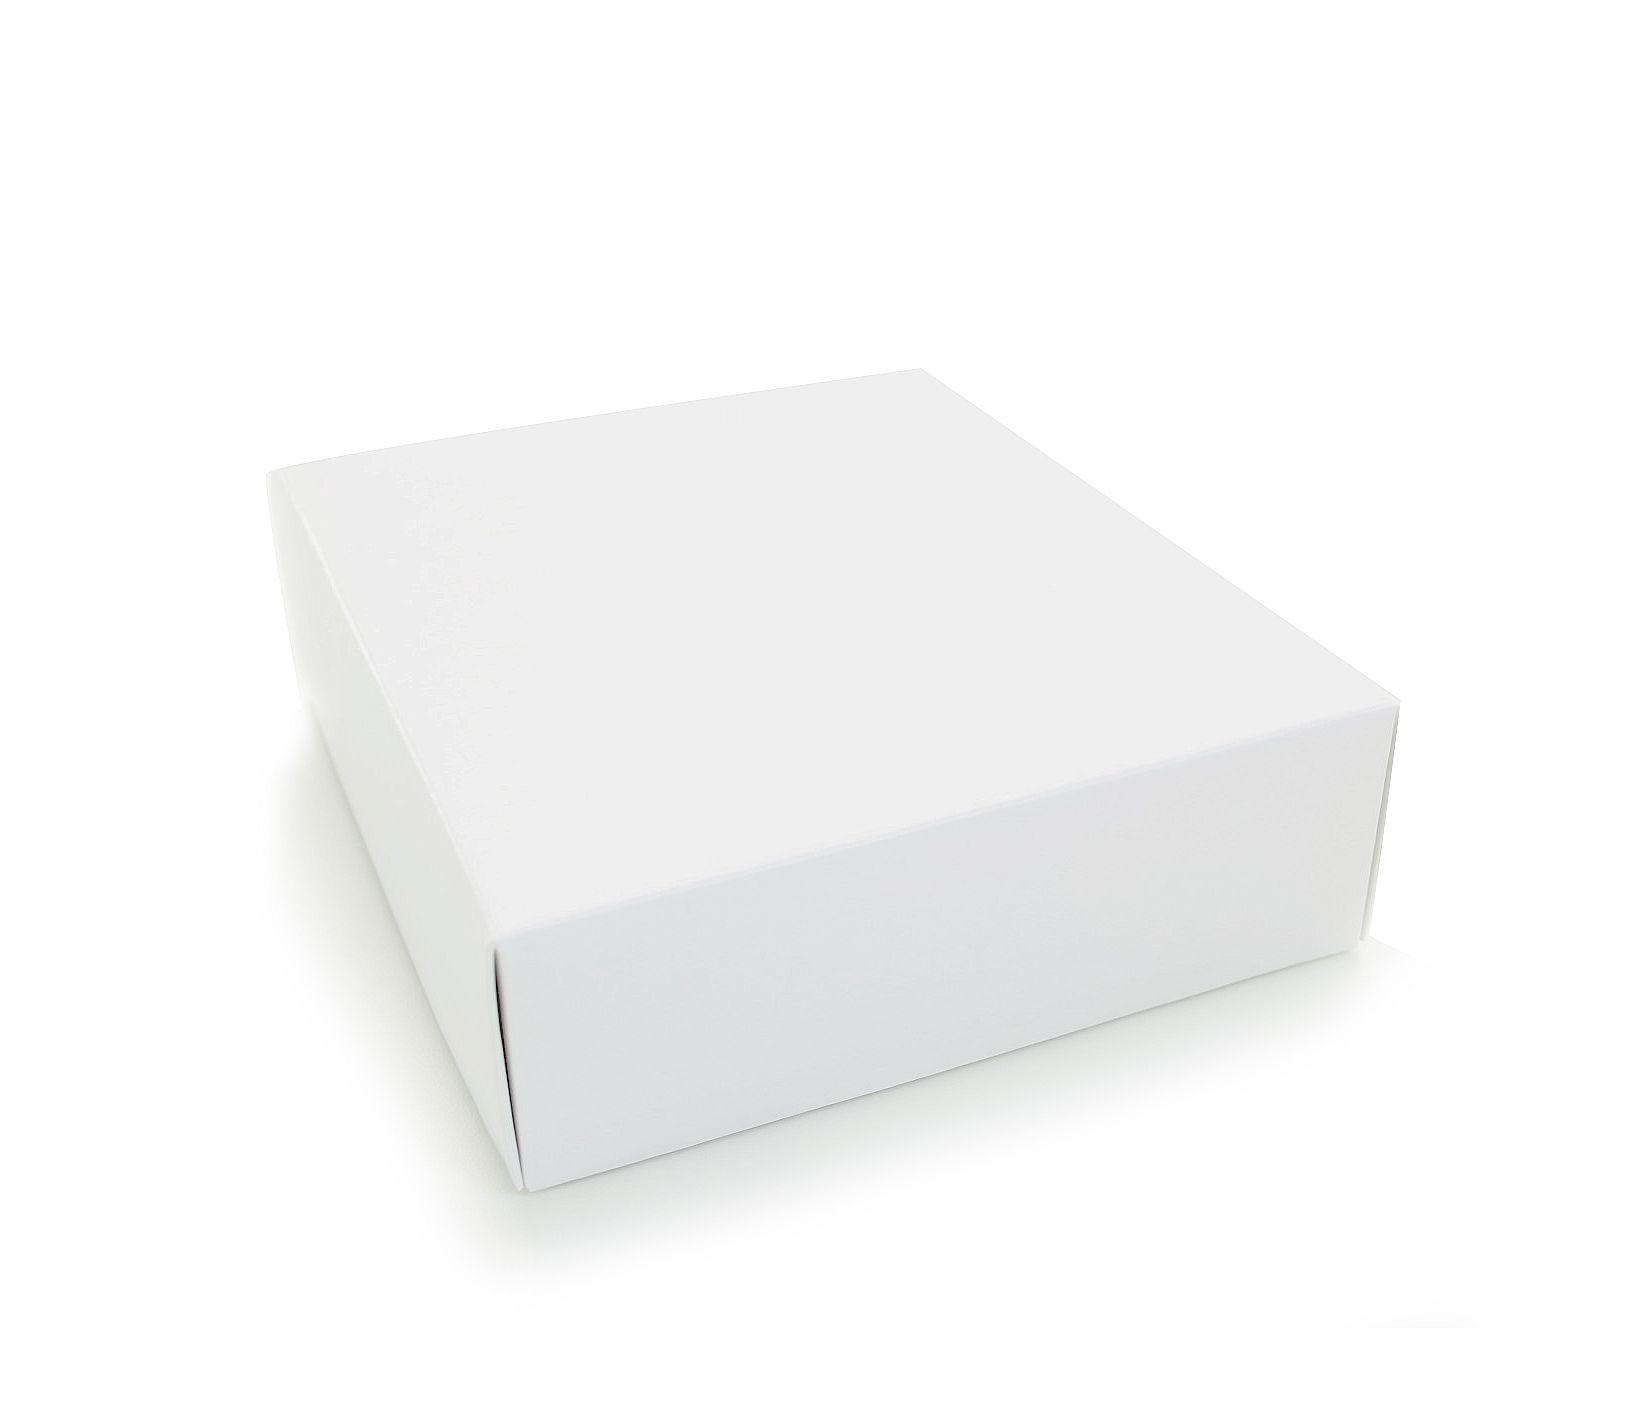 Ref 003 Branca - Caixa c/ tampa papel - 14x14x5 cm - c/ 10 unidades